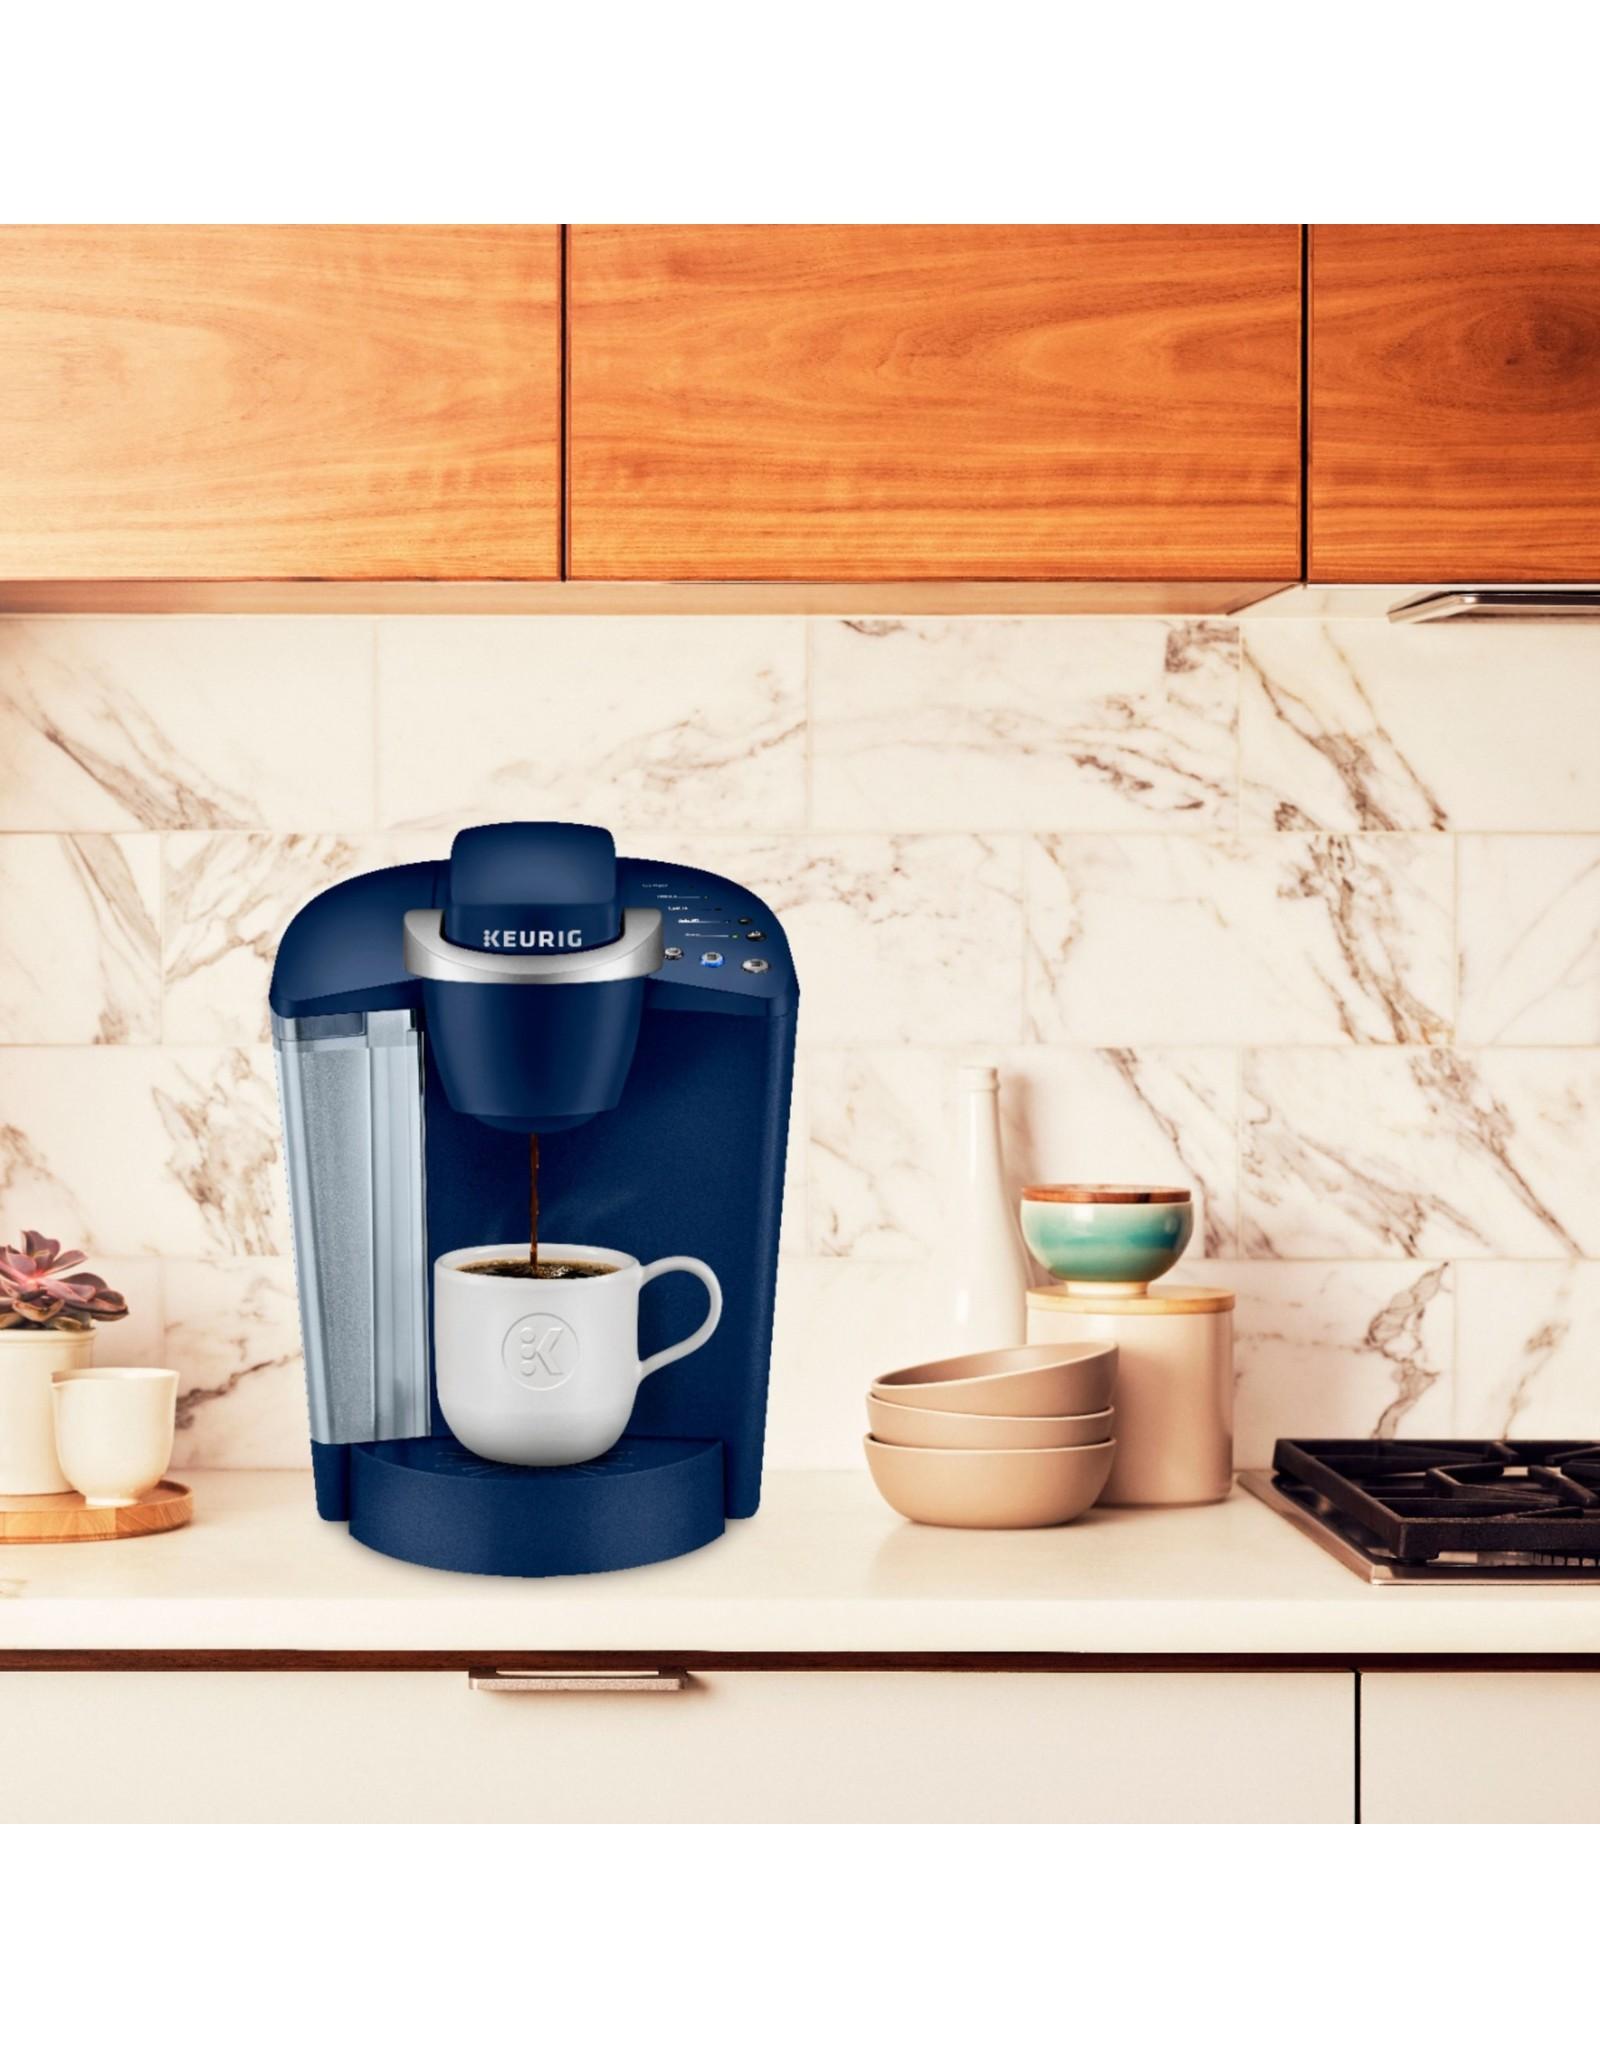 keurig 5000204128 Keurig - K-Classic K50 Single Serve K-Cup Pod Coffee Maker - Patriot Blue